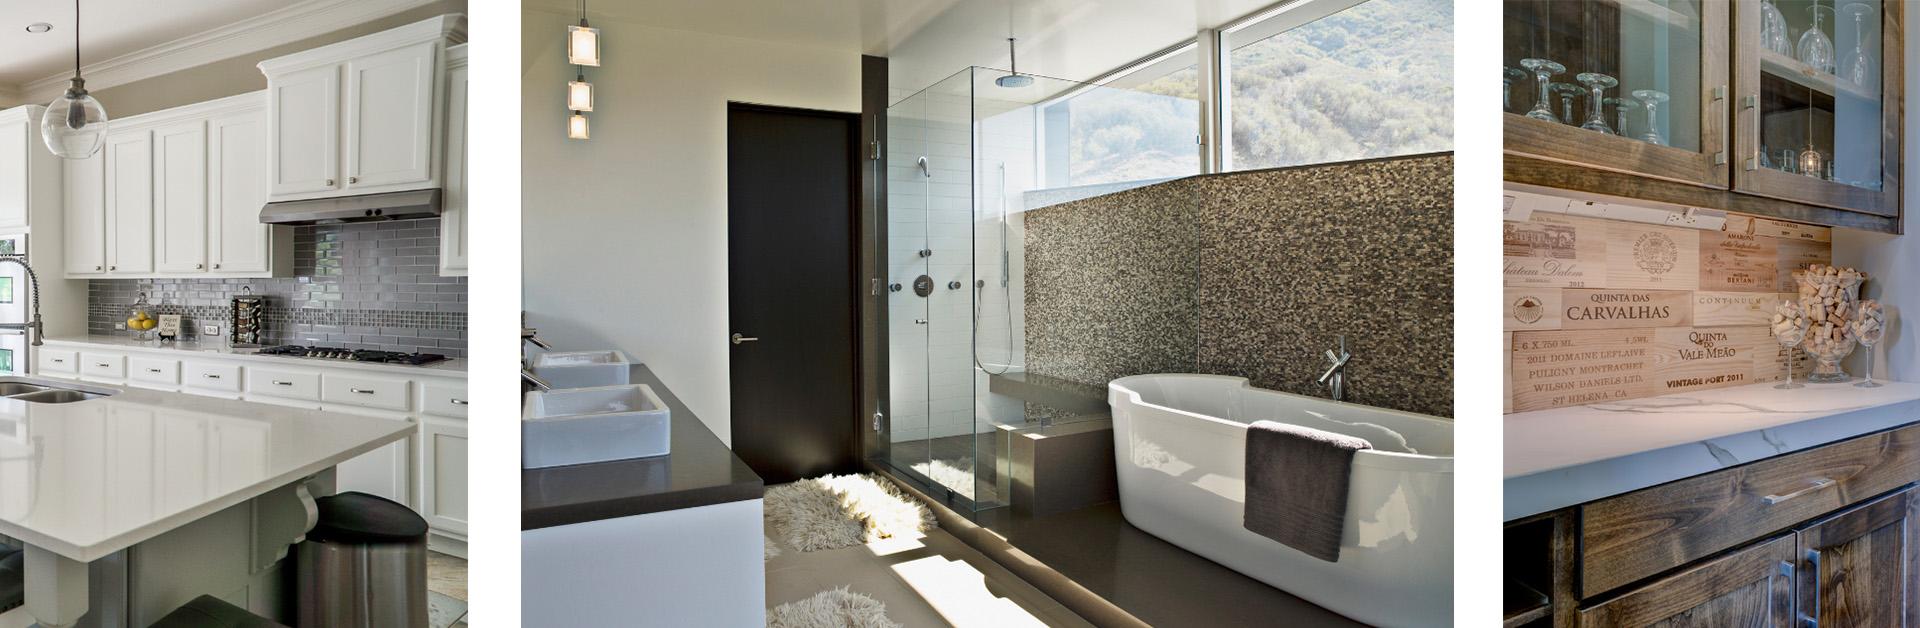 kitchen-bathroom-bg